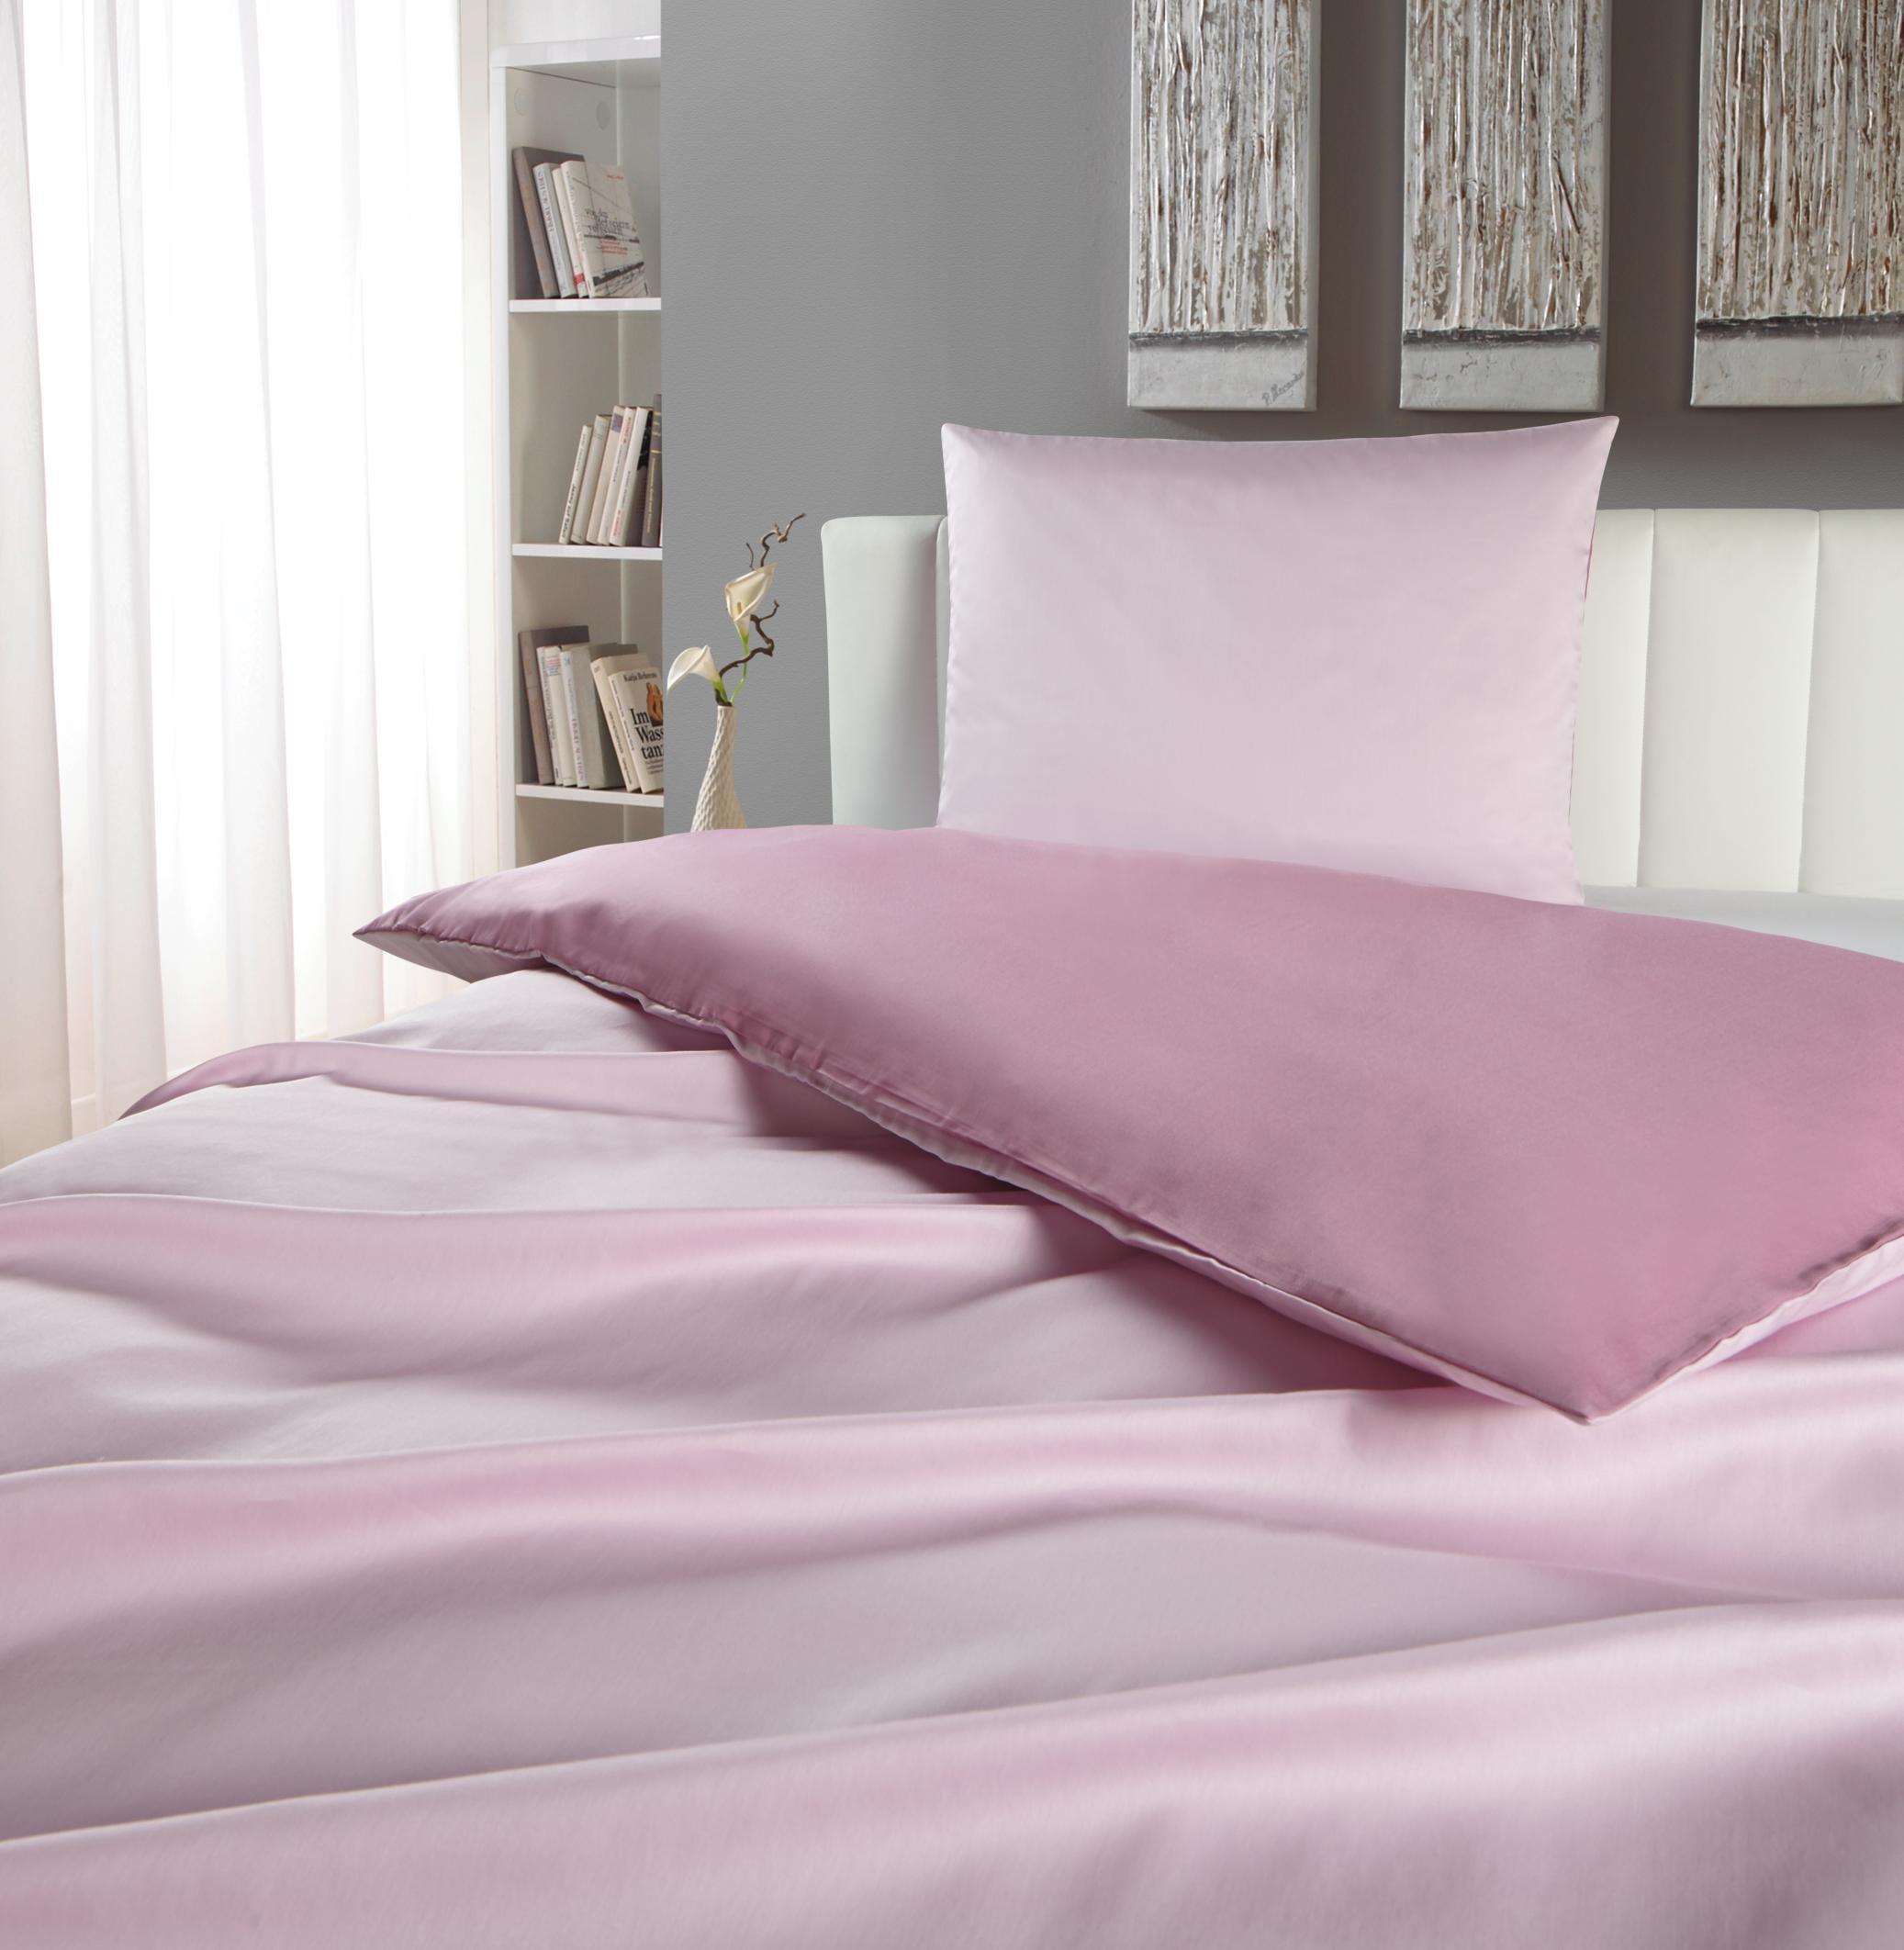 bettw sche 140 200 my blog. Black Bedroom Furniture Sets. Home Design Ideas